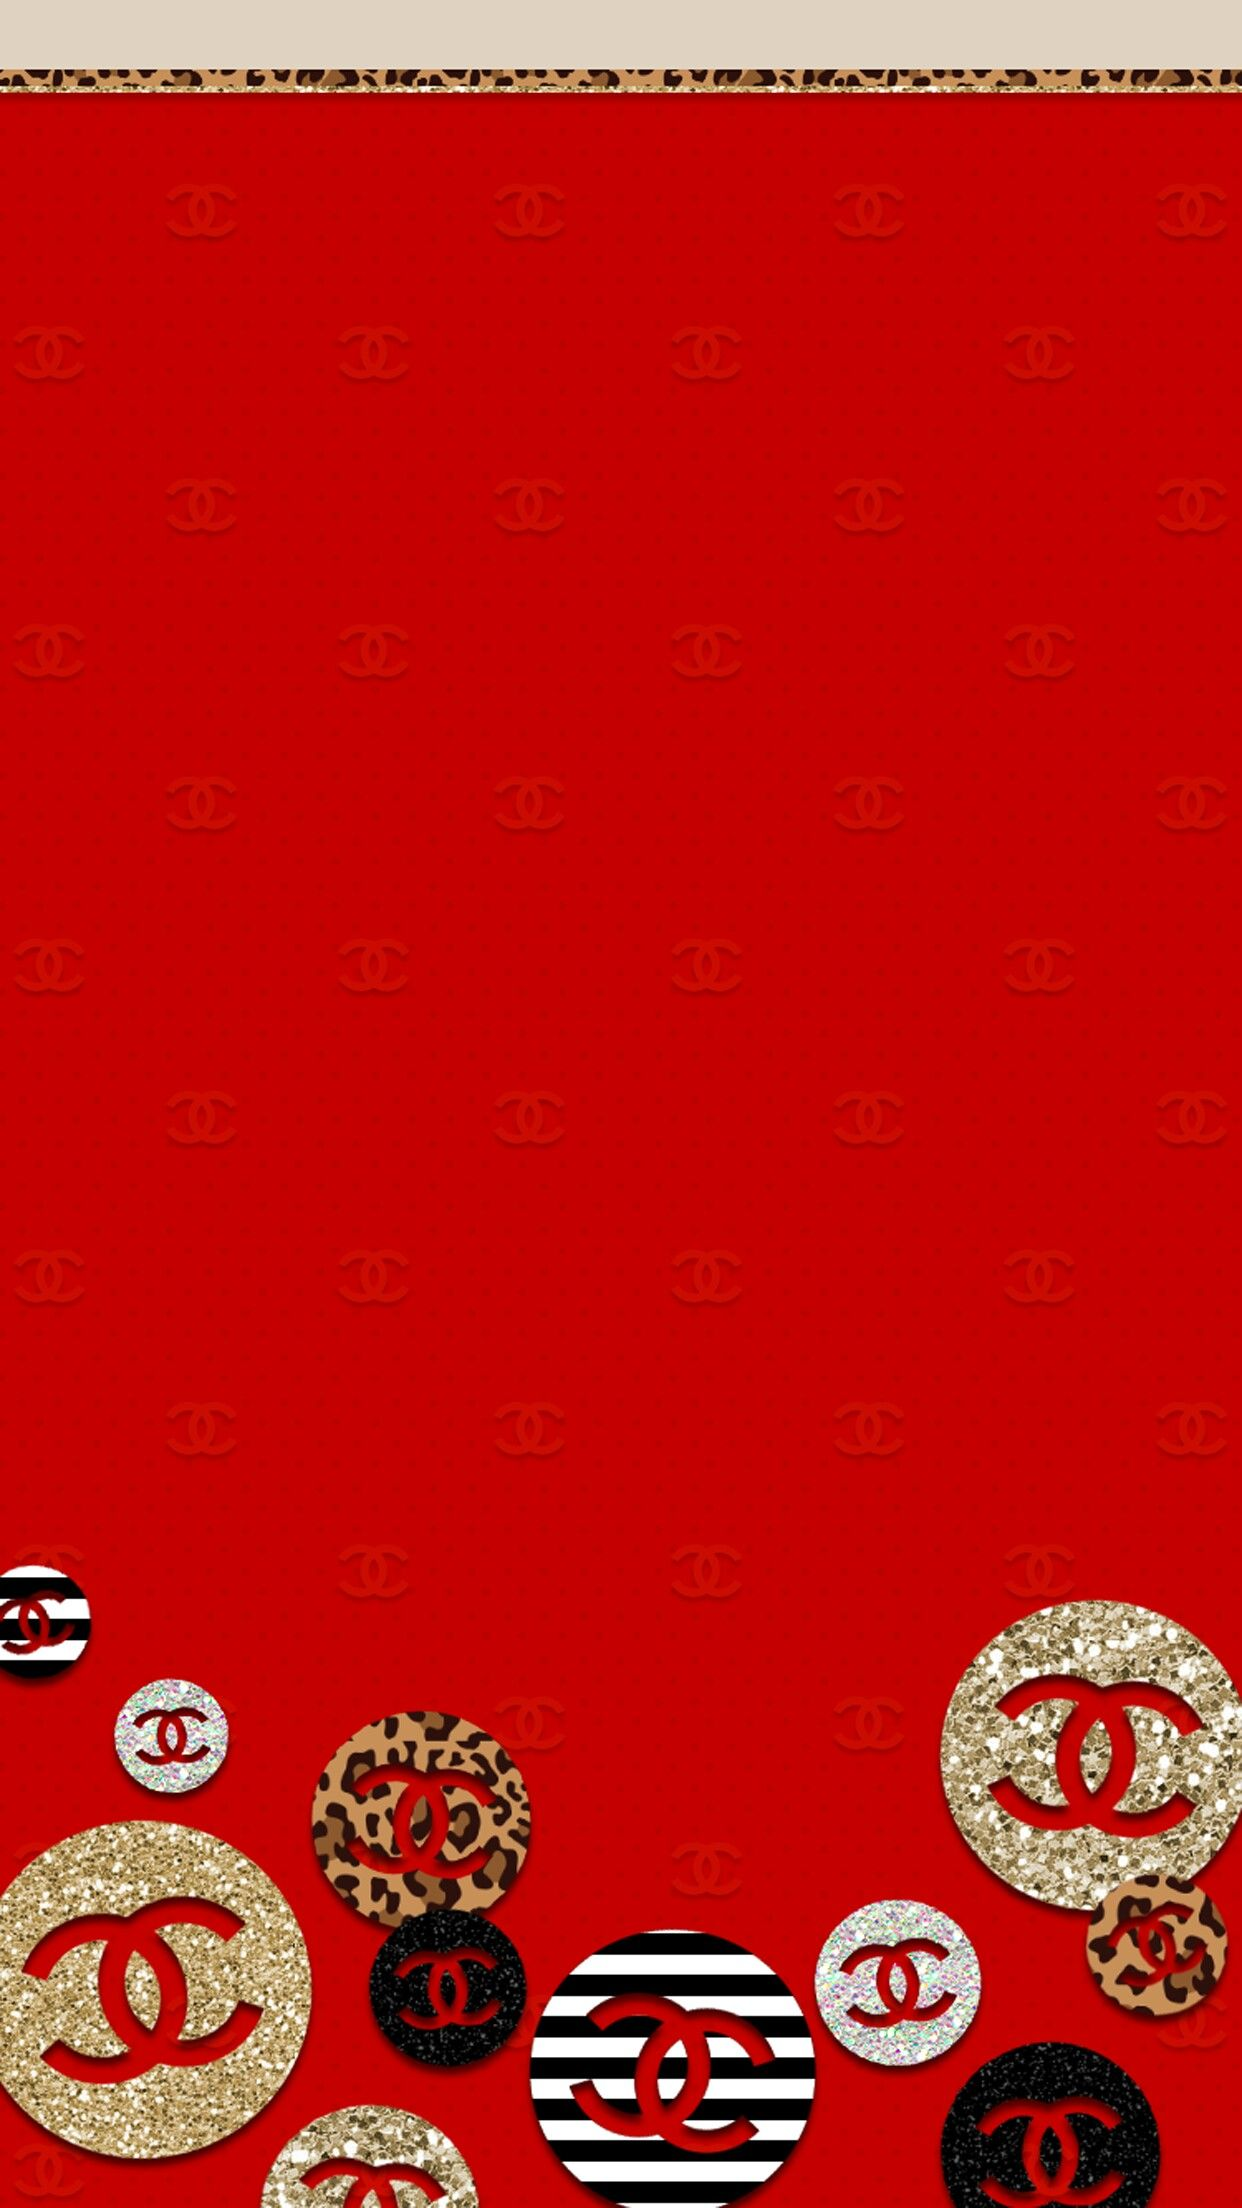 Chanel 壁紙 赤 シャネル ポスター おしゃれな壁紙背景